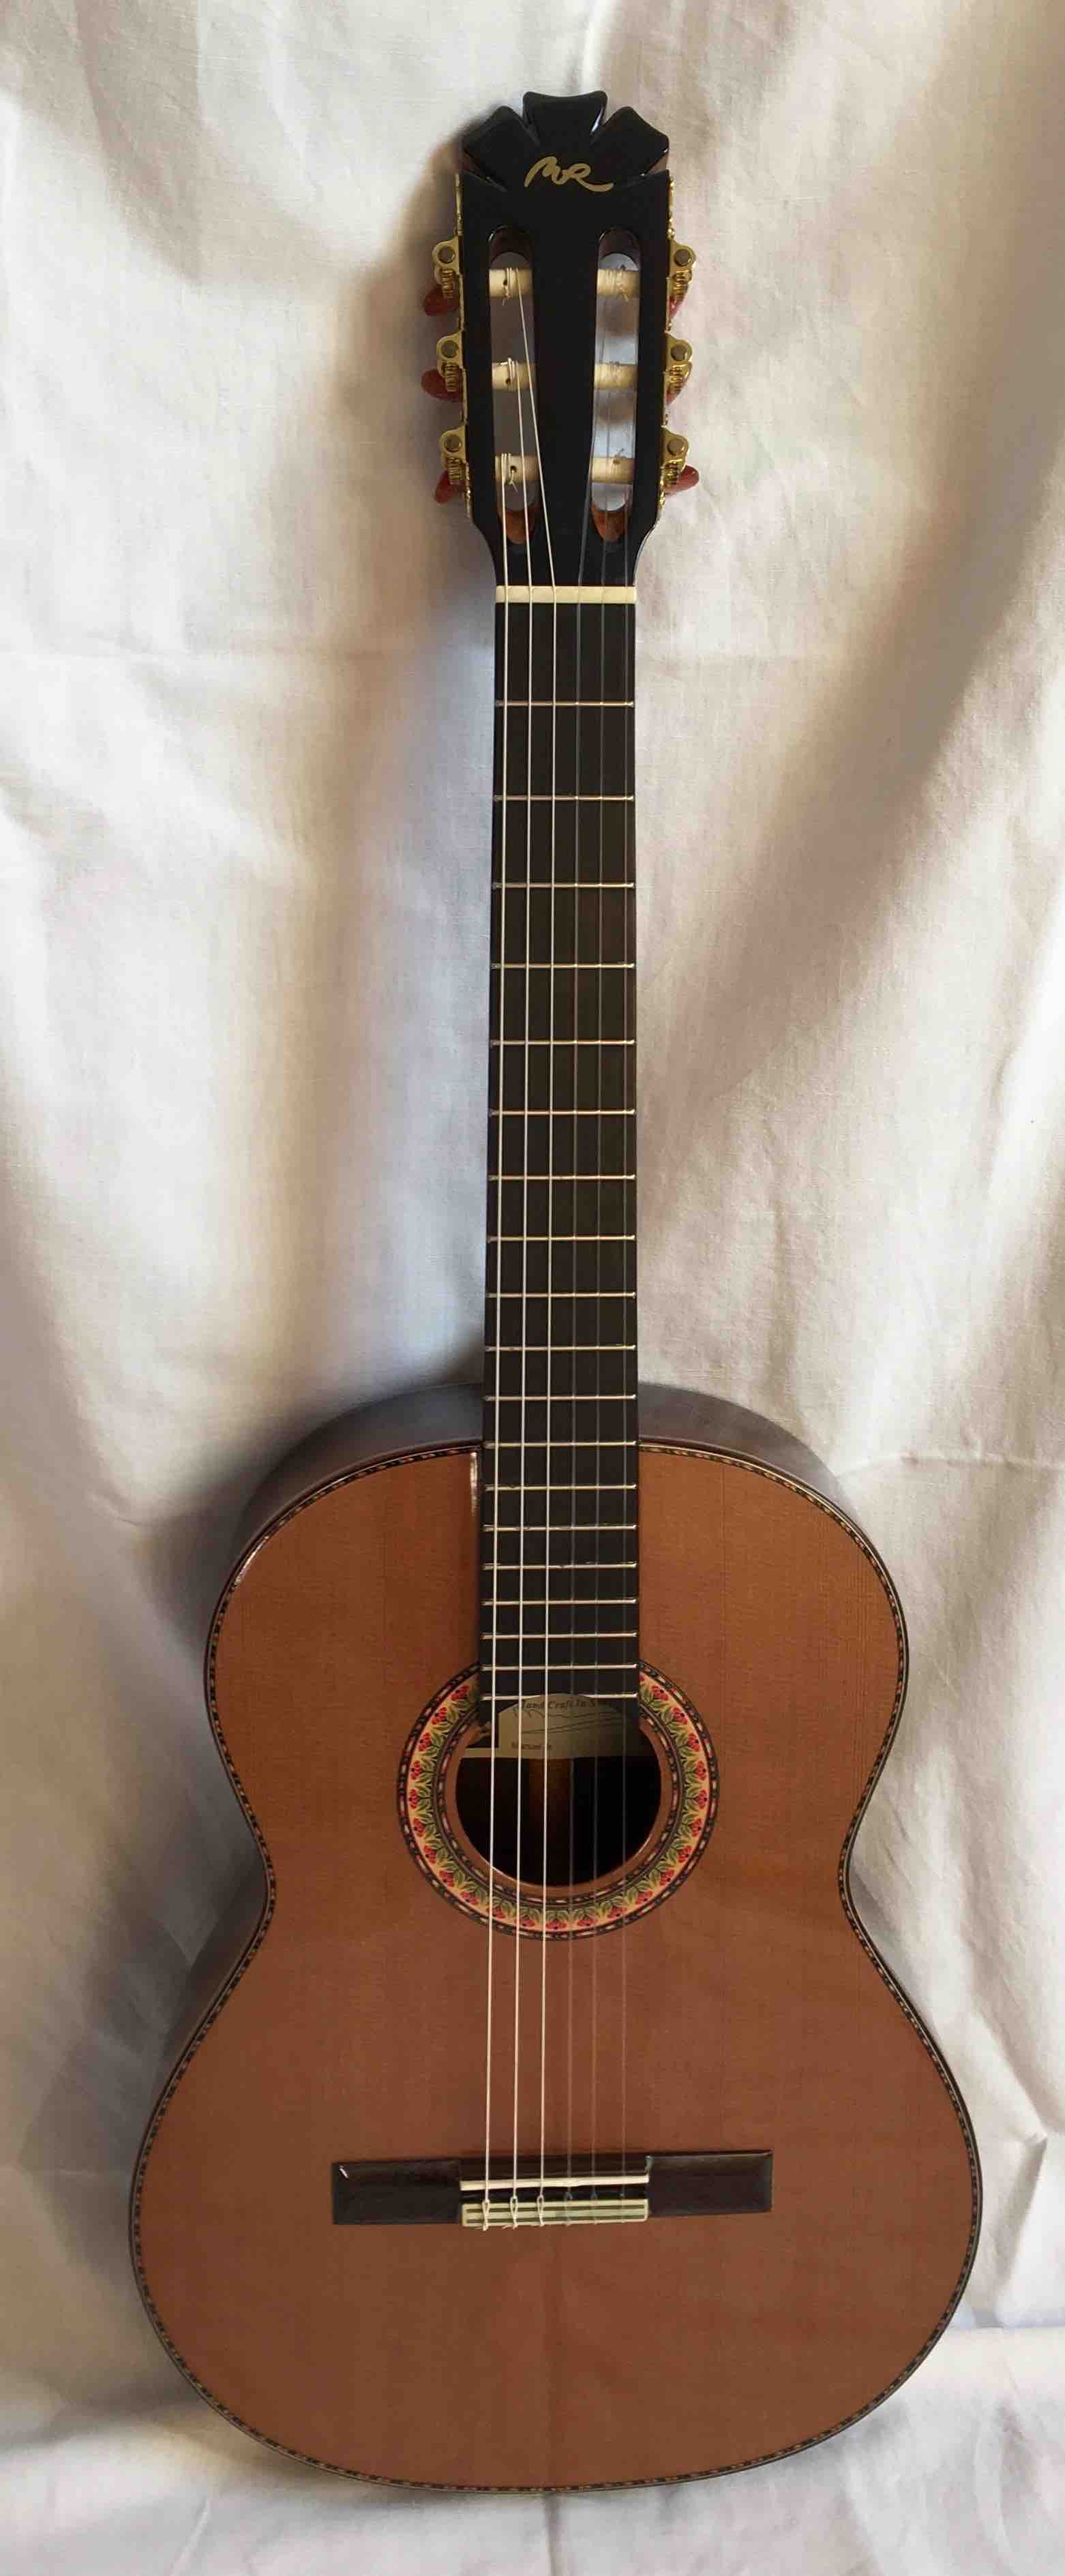 guitare classique diapason 63